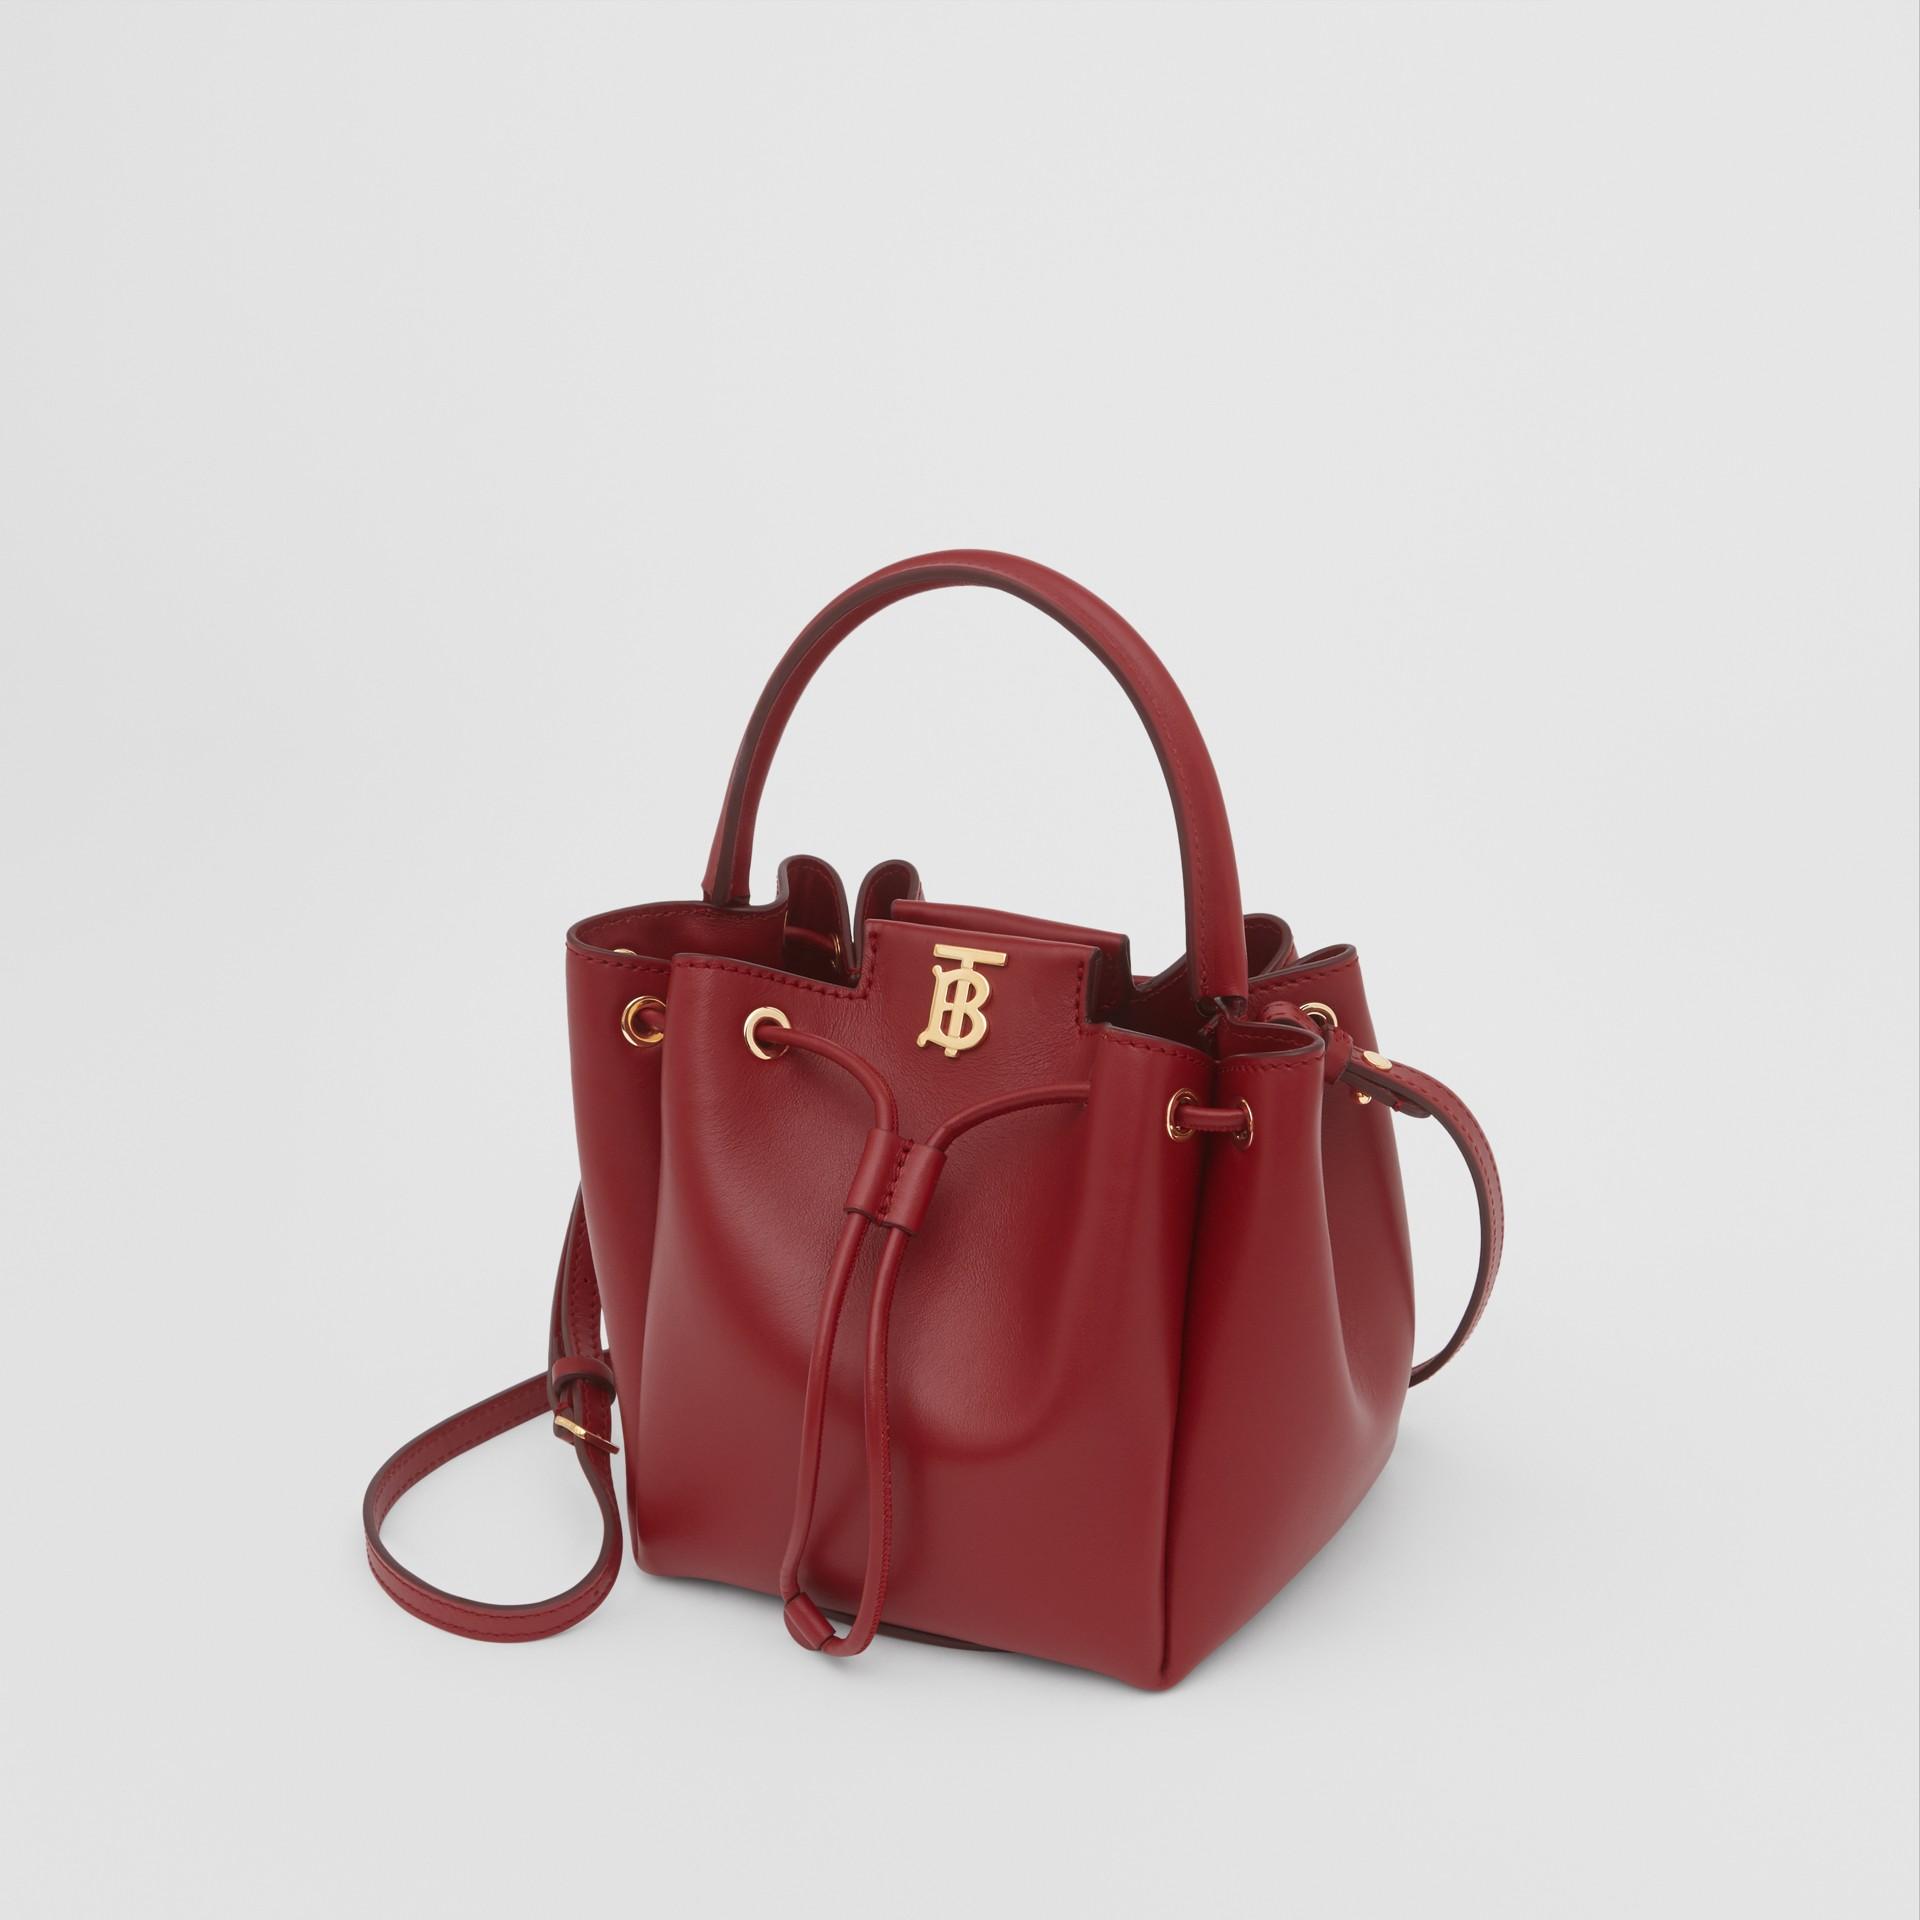 Monogram Motif Leather Bucket Bag in Dark Carmine - Women | Burberry United States - gallery image 2